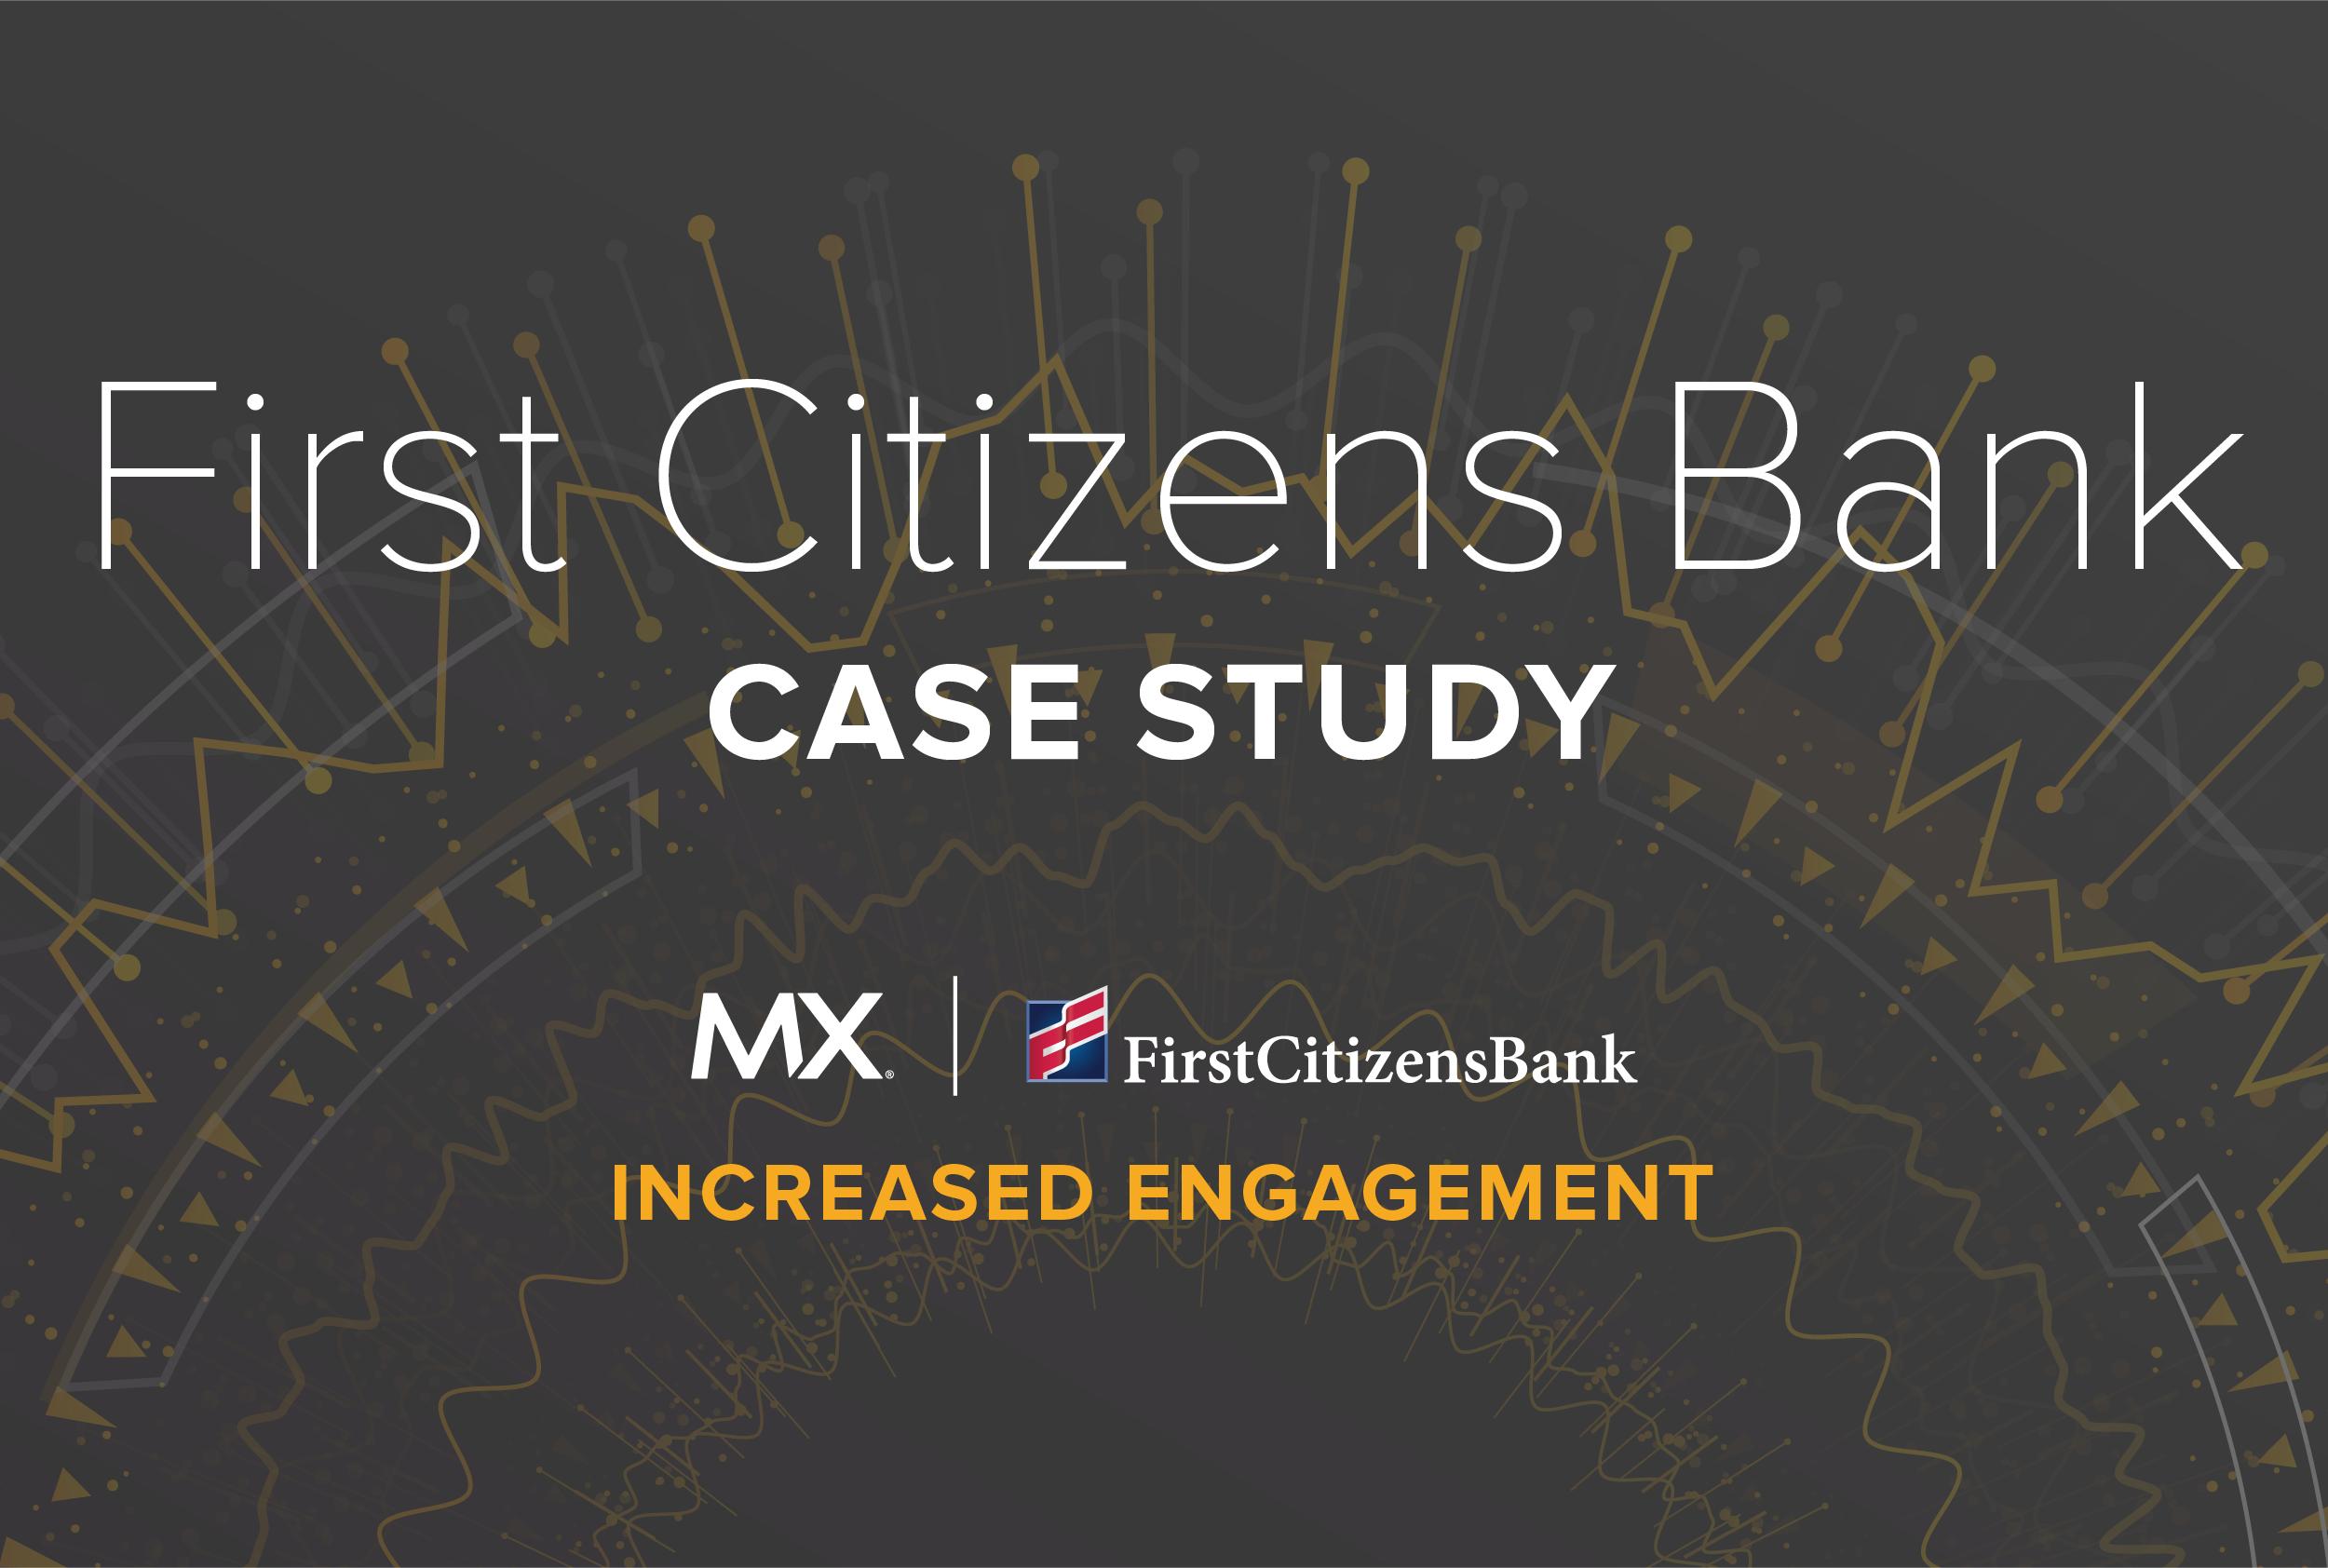 Case Study: First Citizens Bank